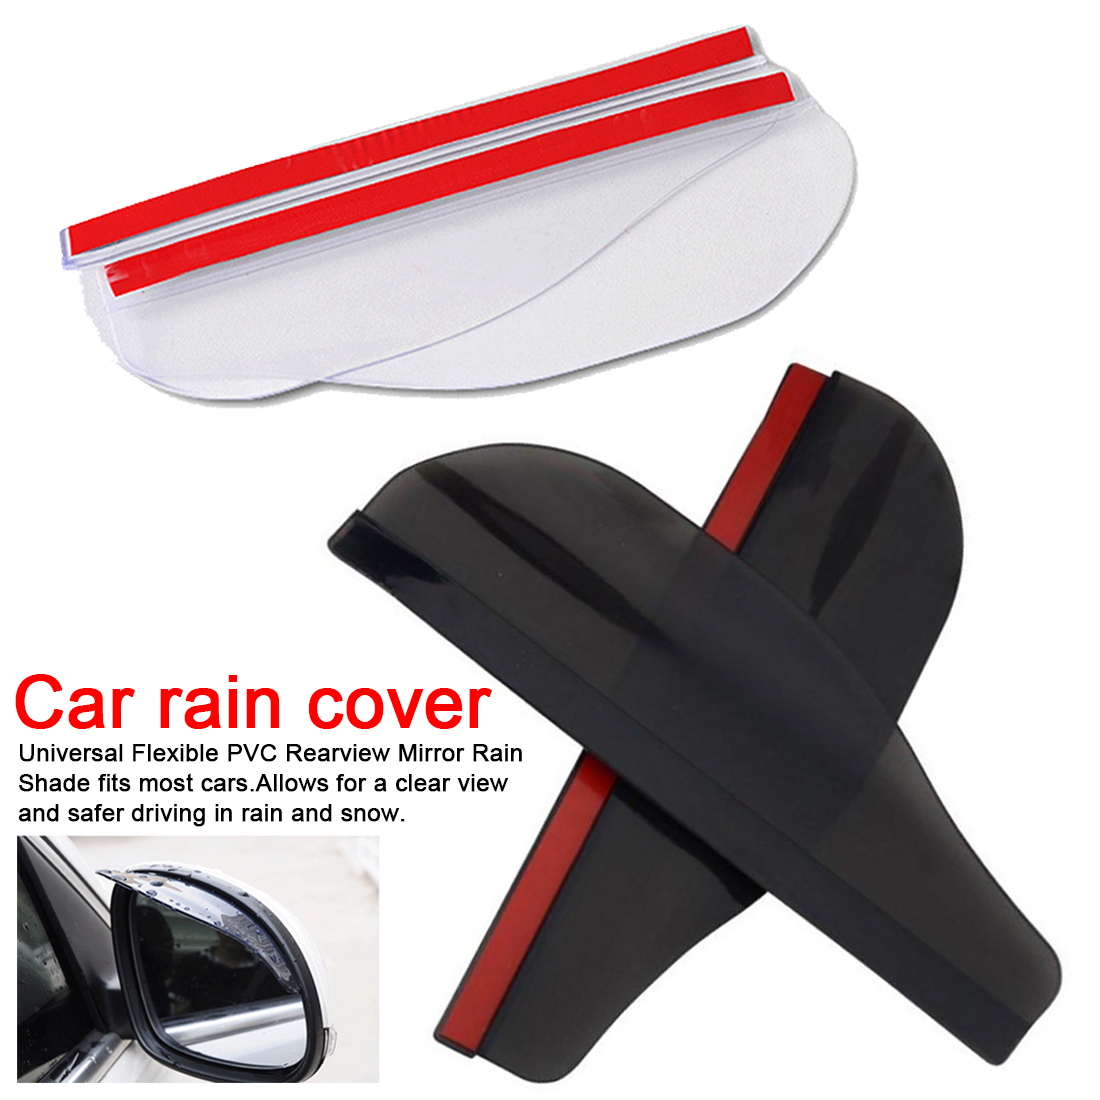 2 Pieces Car side Mirror waterproof Sun Visor Rain Eyebrow Auto Car Rear View Side Rain Shield Flexible Protector For Car